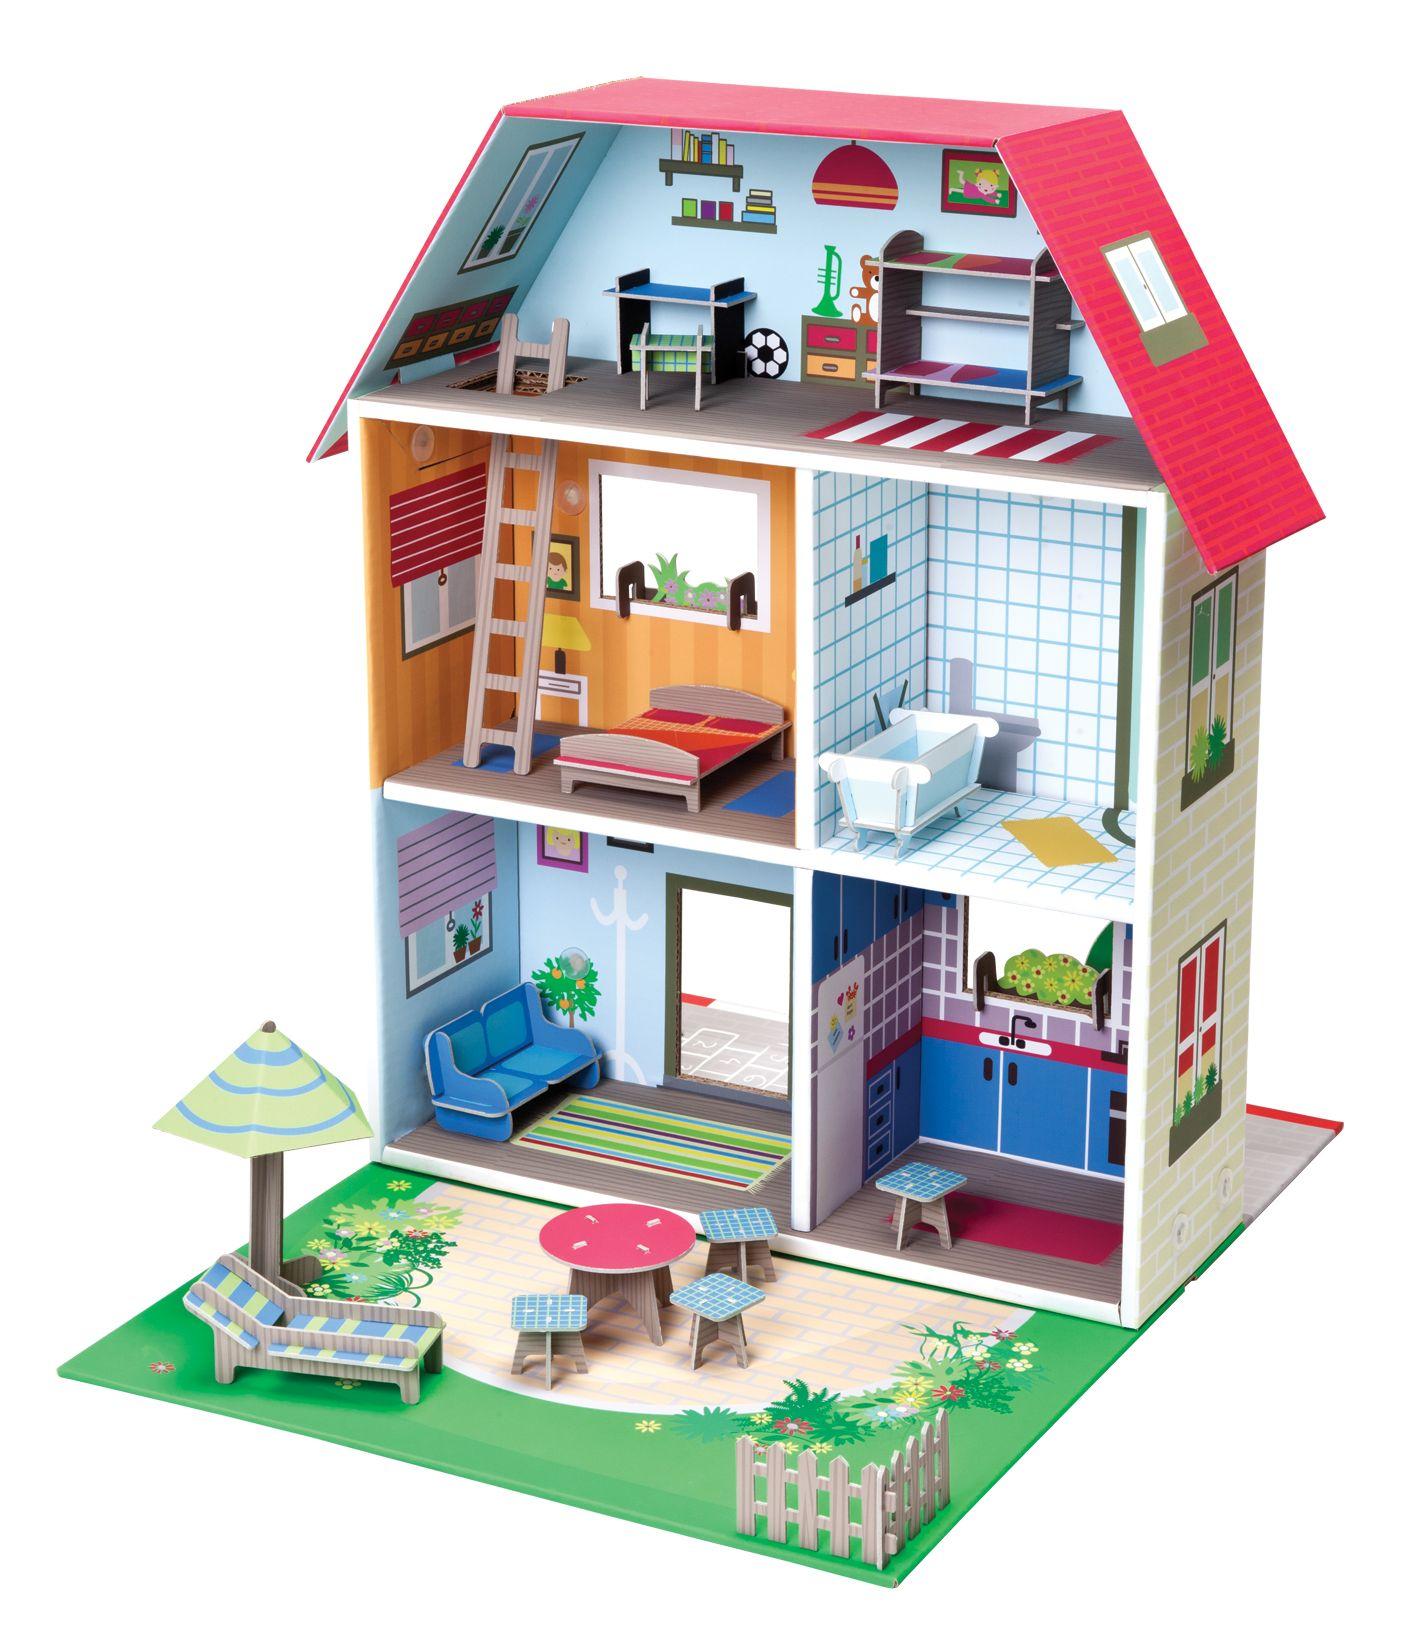 casa de muñecas murielle   casas de muñecas   Pinterest   Muñecas ...